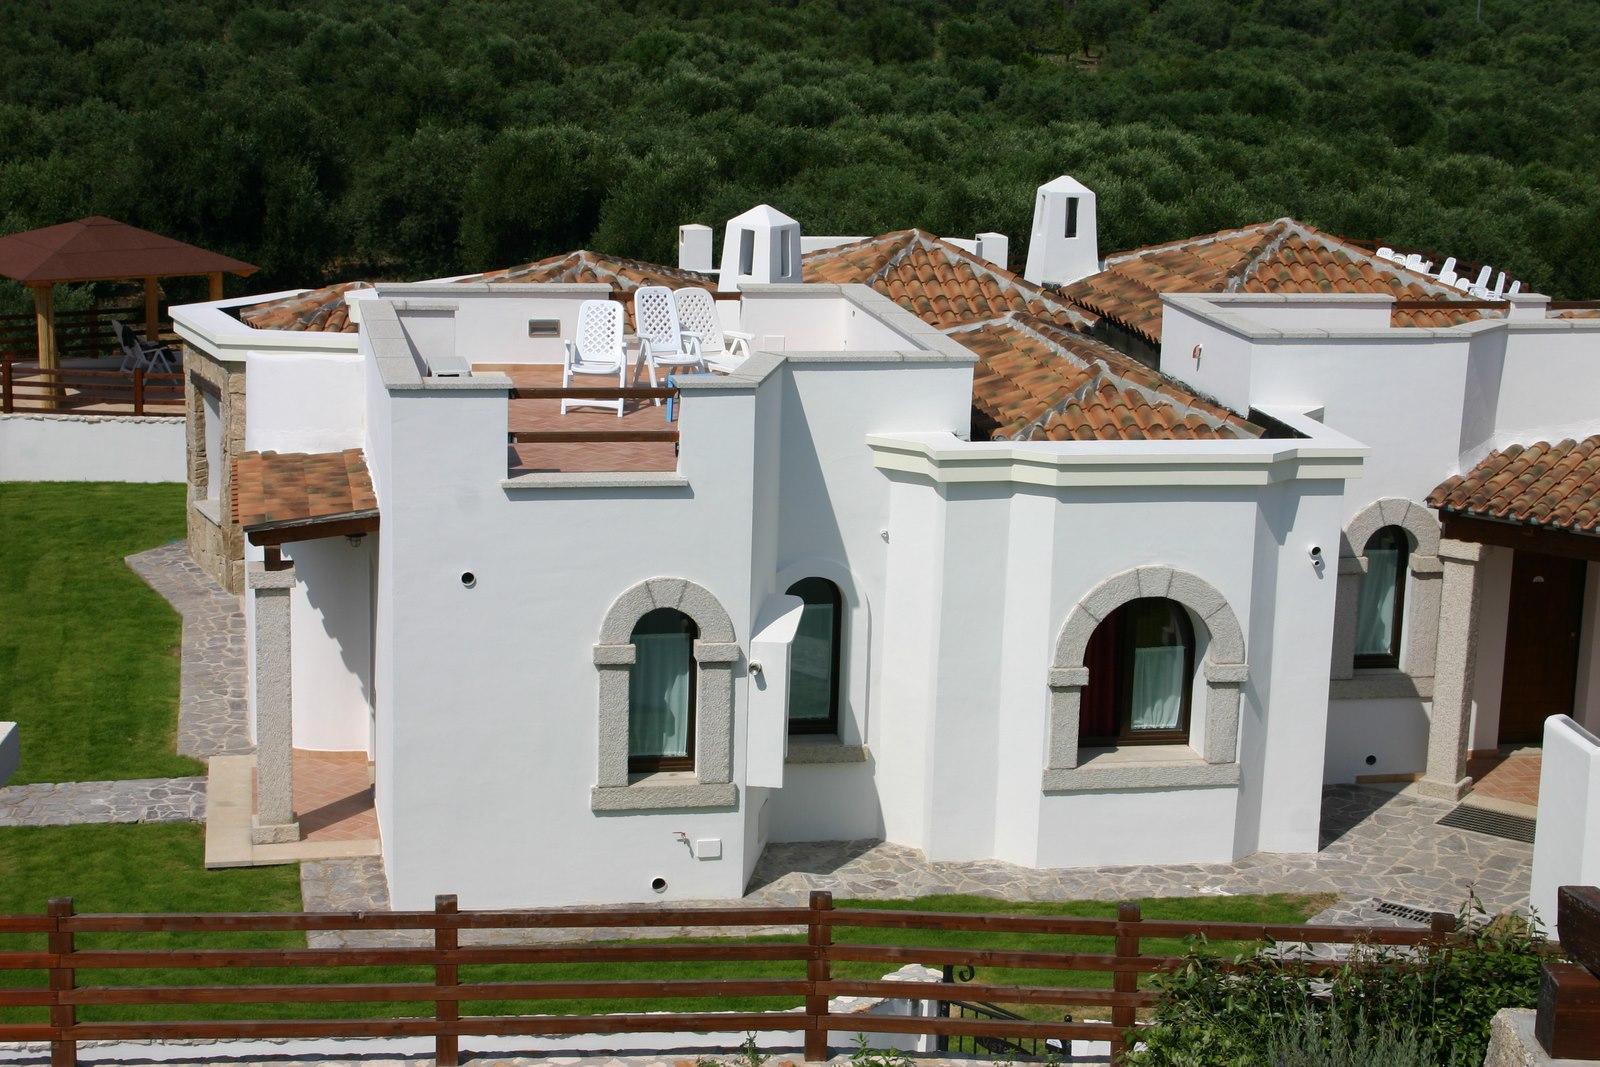 Ferienhaus Carru (877335), Sant Angelo Custode, Sassari, Sardinien, Italien, Bild 15